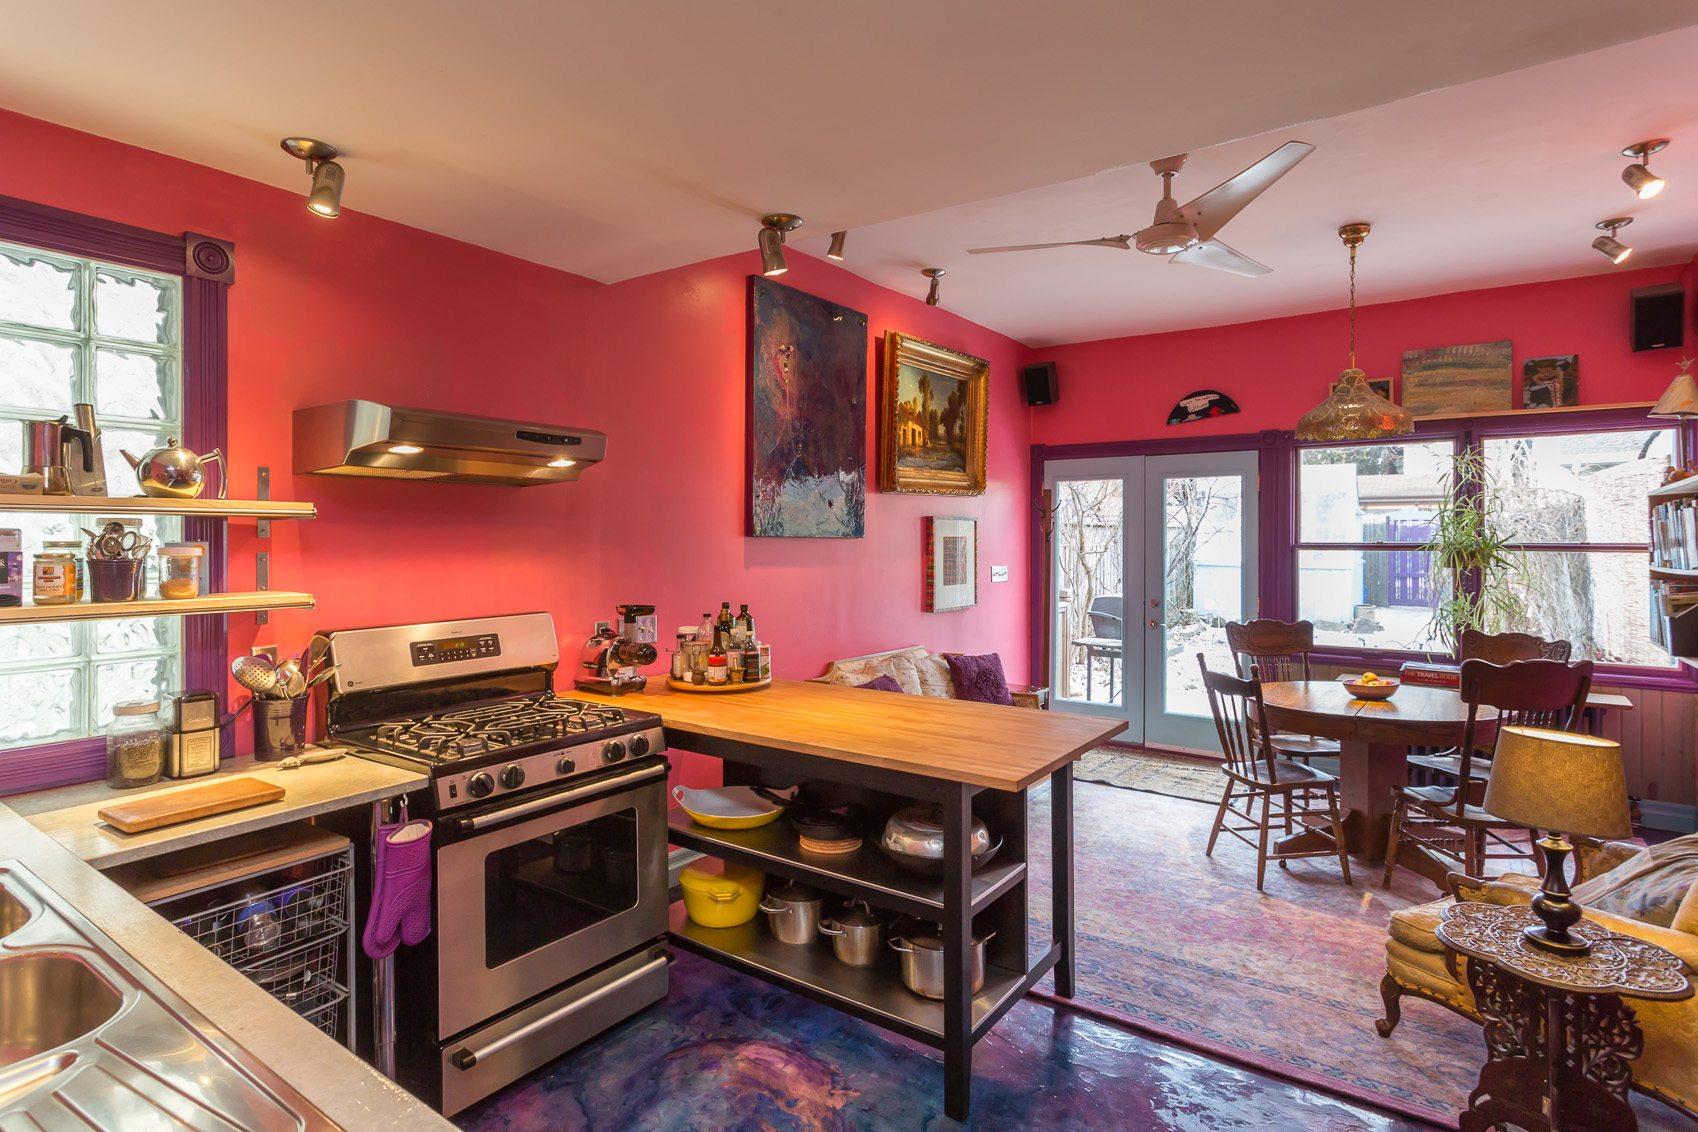 toronto-house-for-sale-44-nassau-street-6